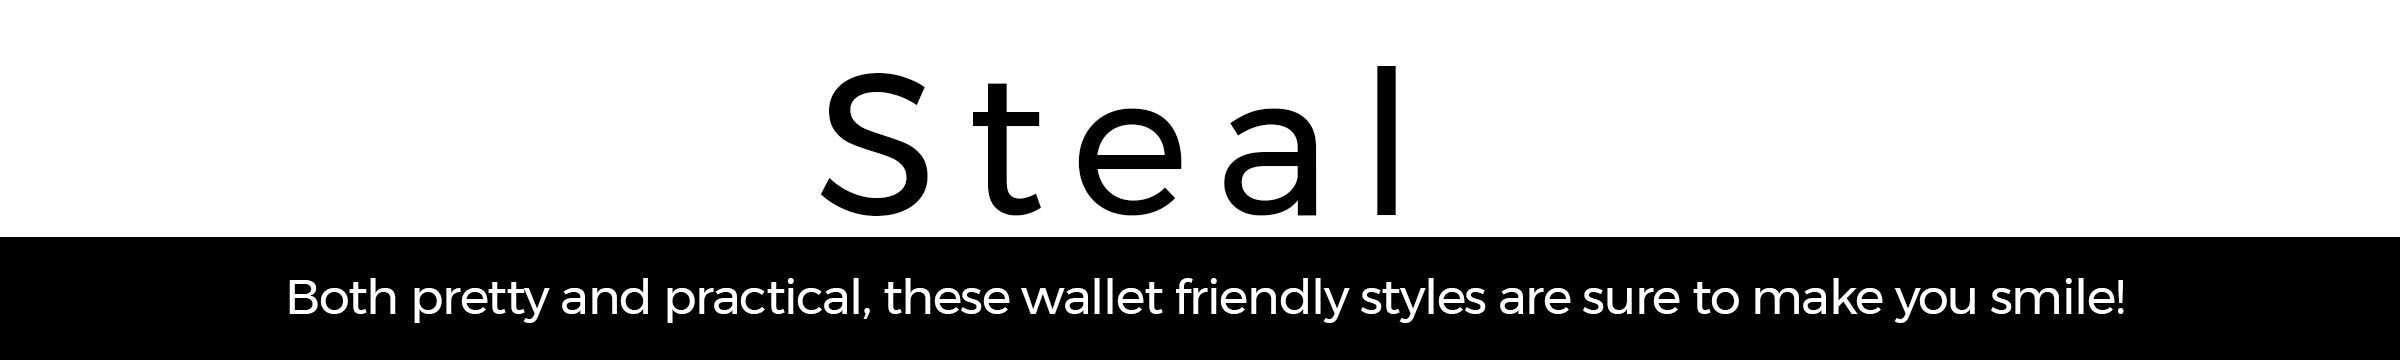 Steal - Header.jpg